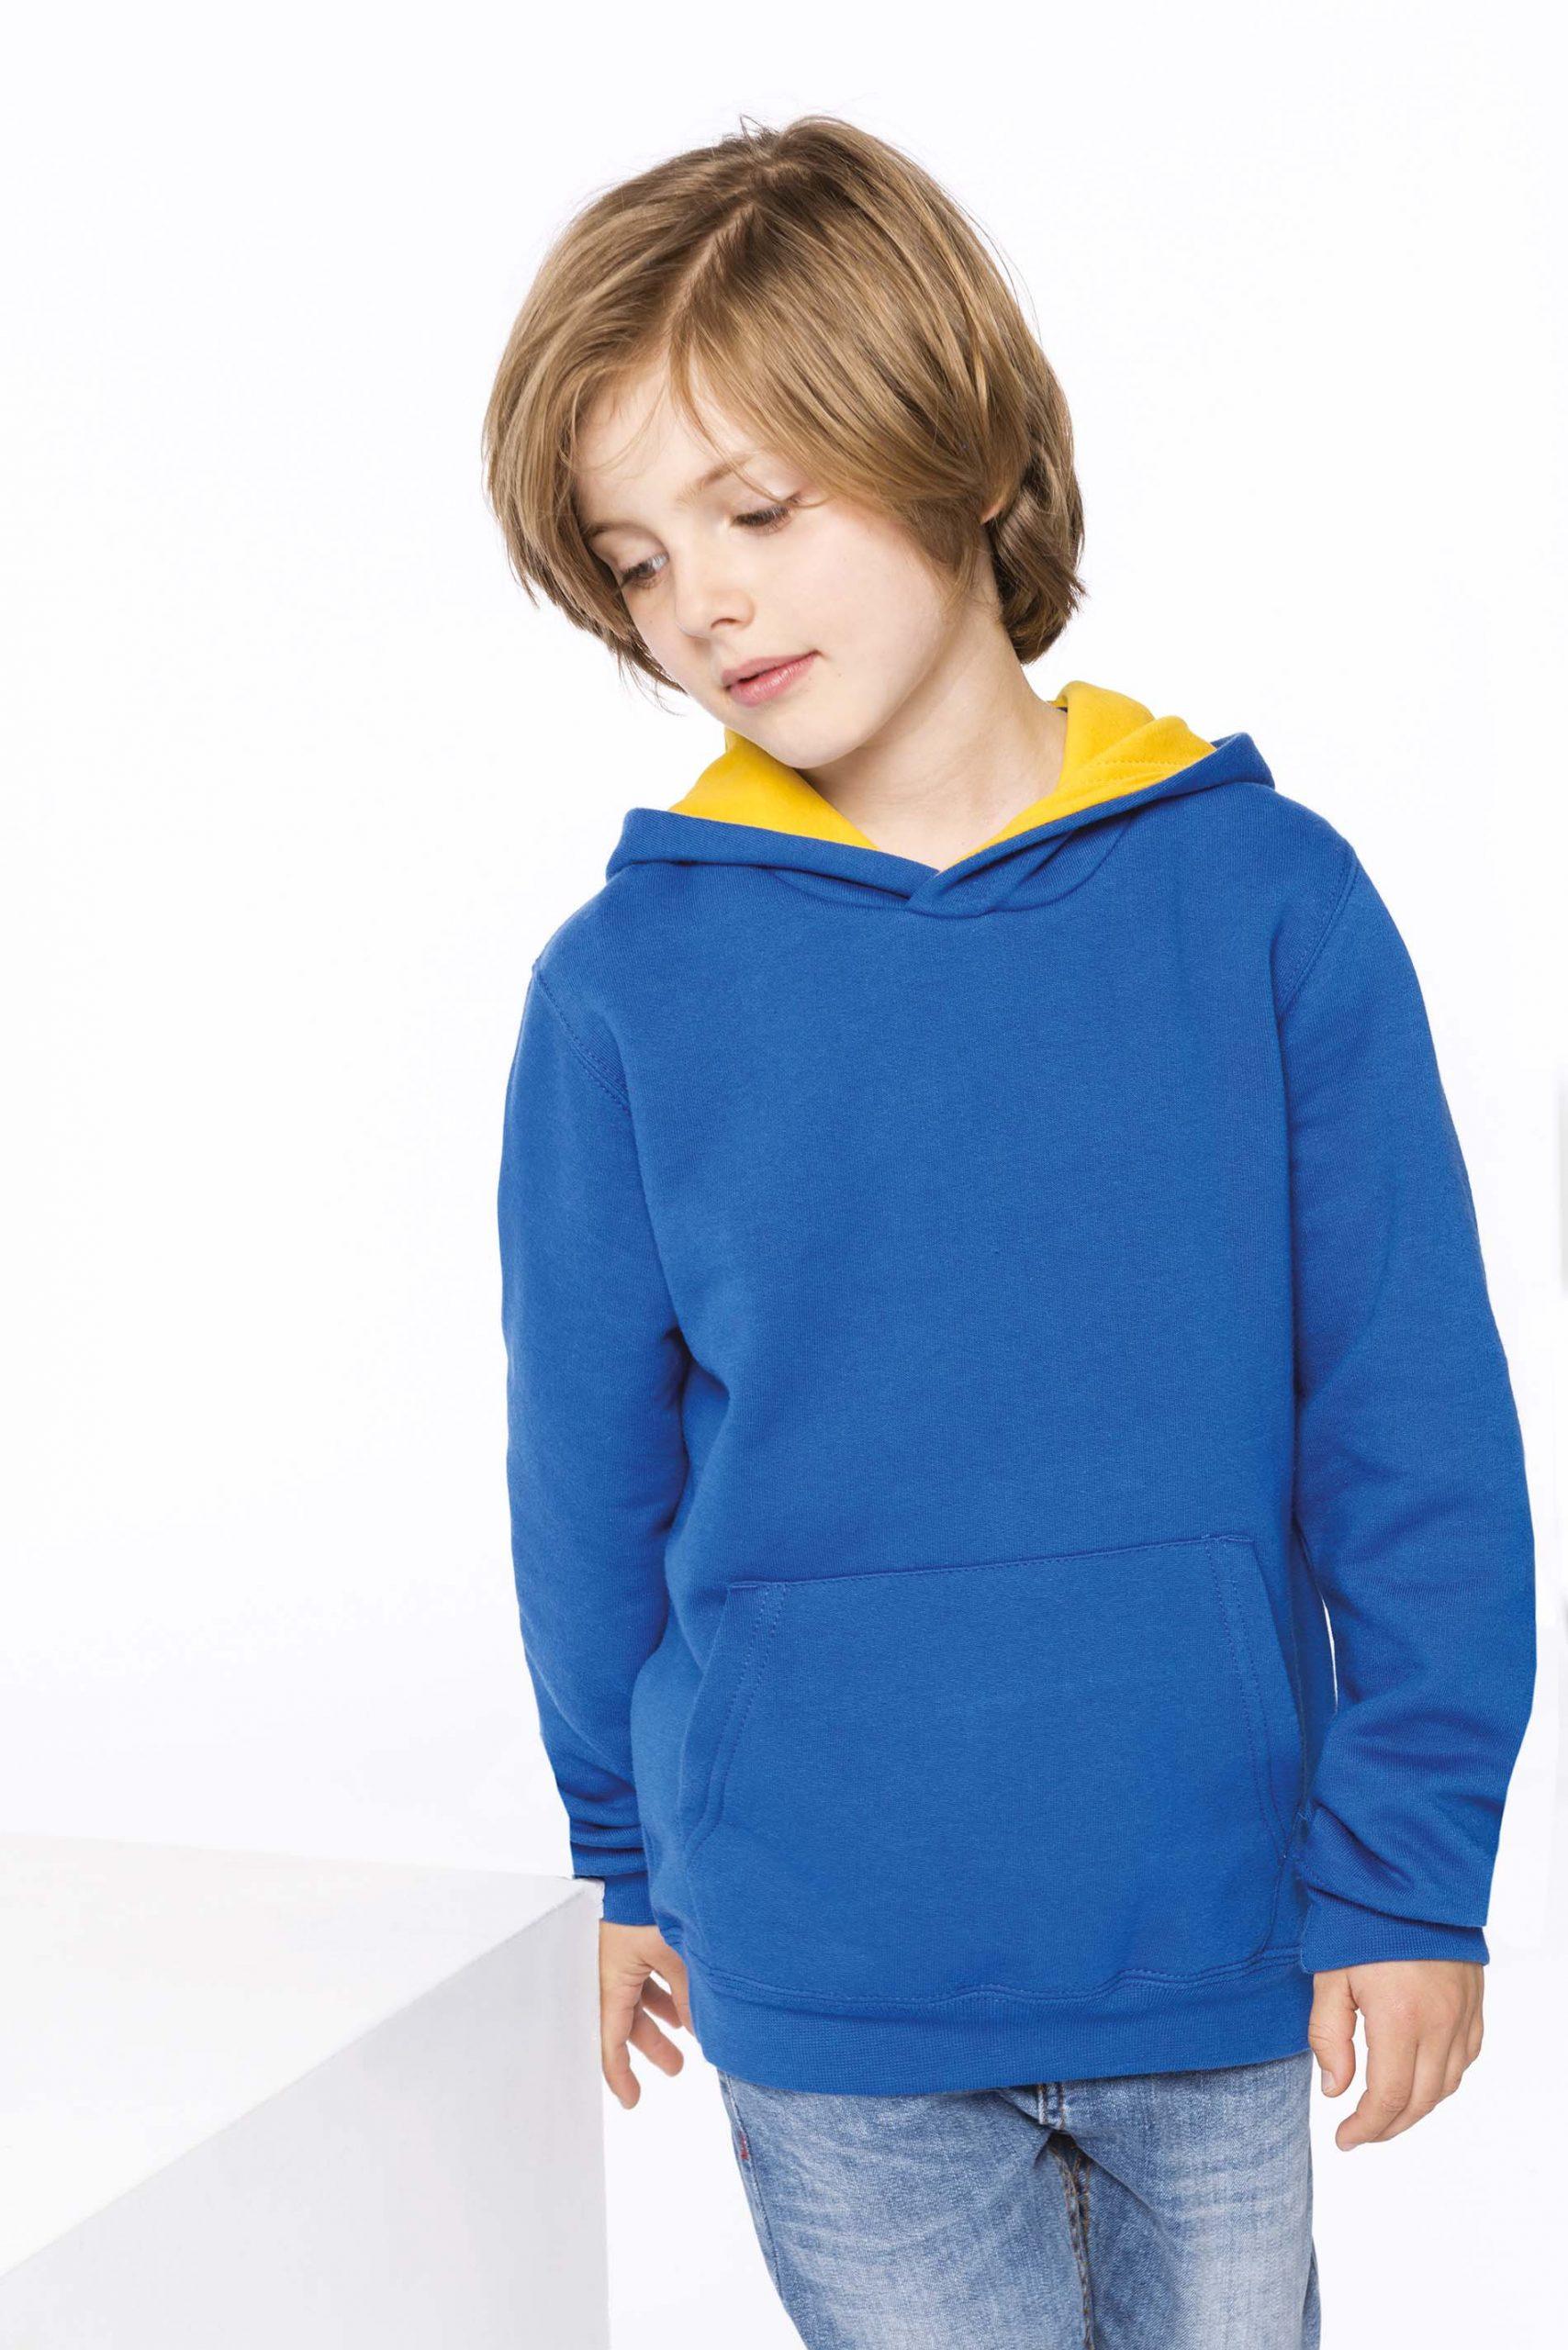 Contrast Hooded Sweatshirt Kids